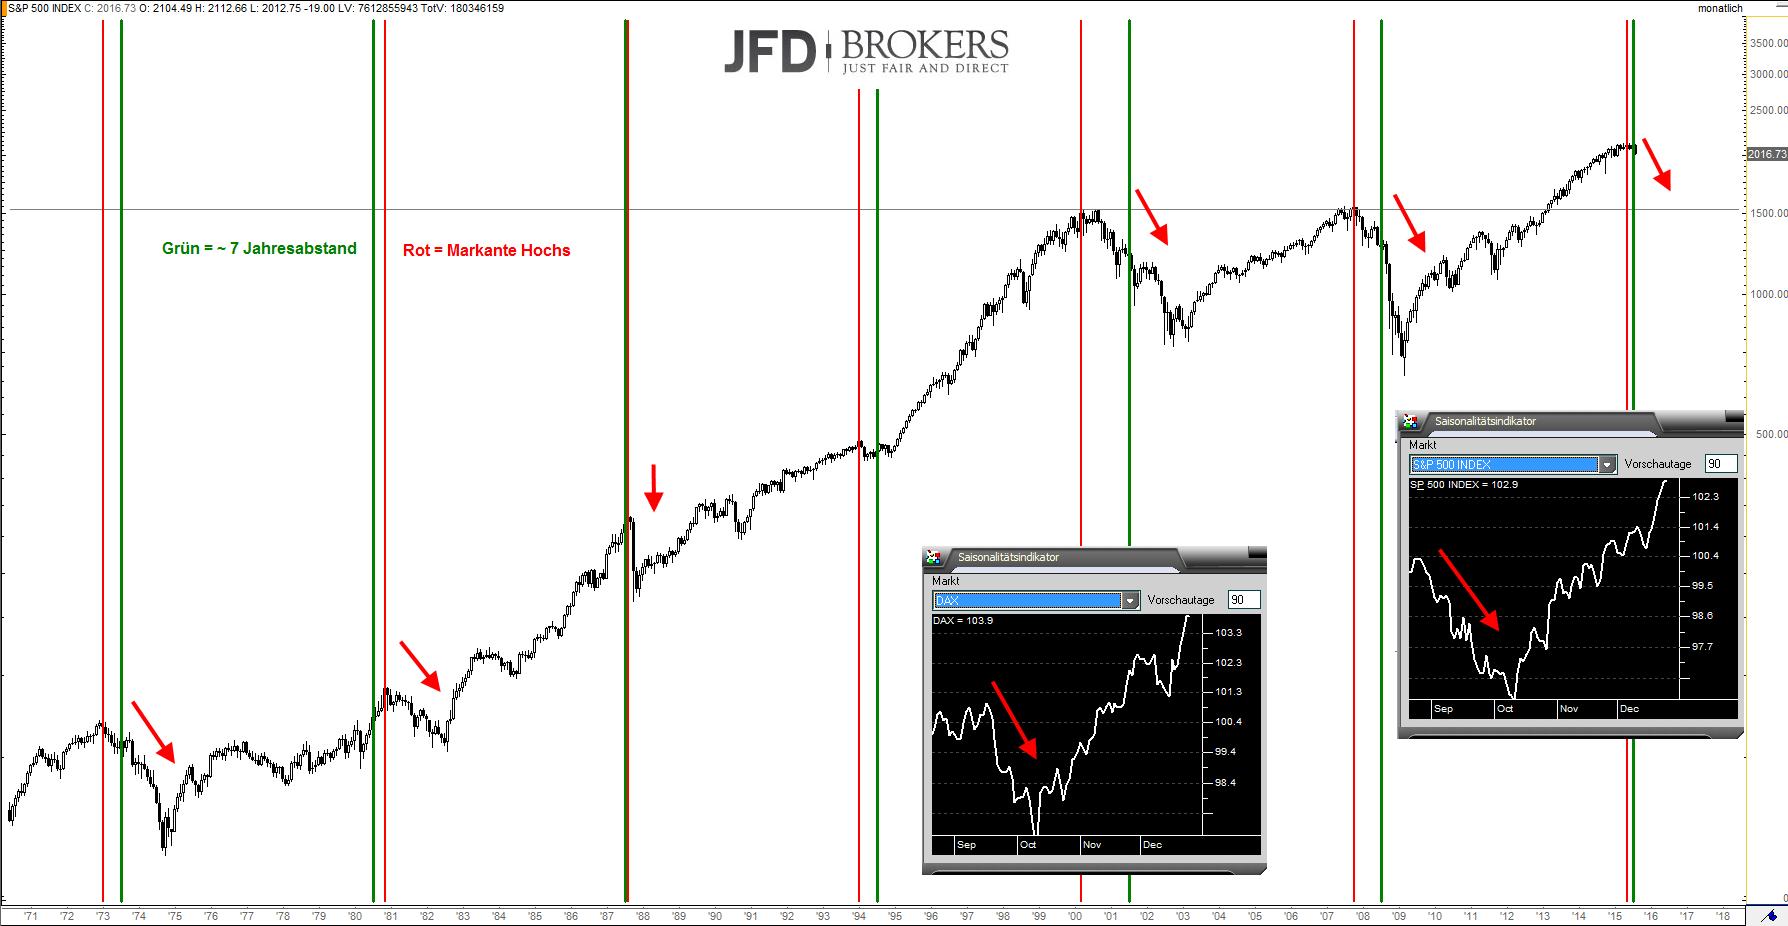 DAX-Kommt-es-so-wenn-es-alle-sehen-S-P-500-beachten-Kommentar-JFD-Brokers-GodmodeTrader.de-3